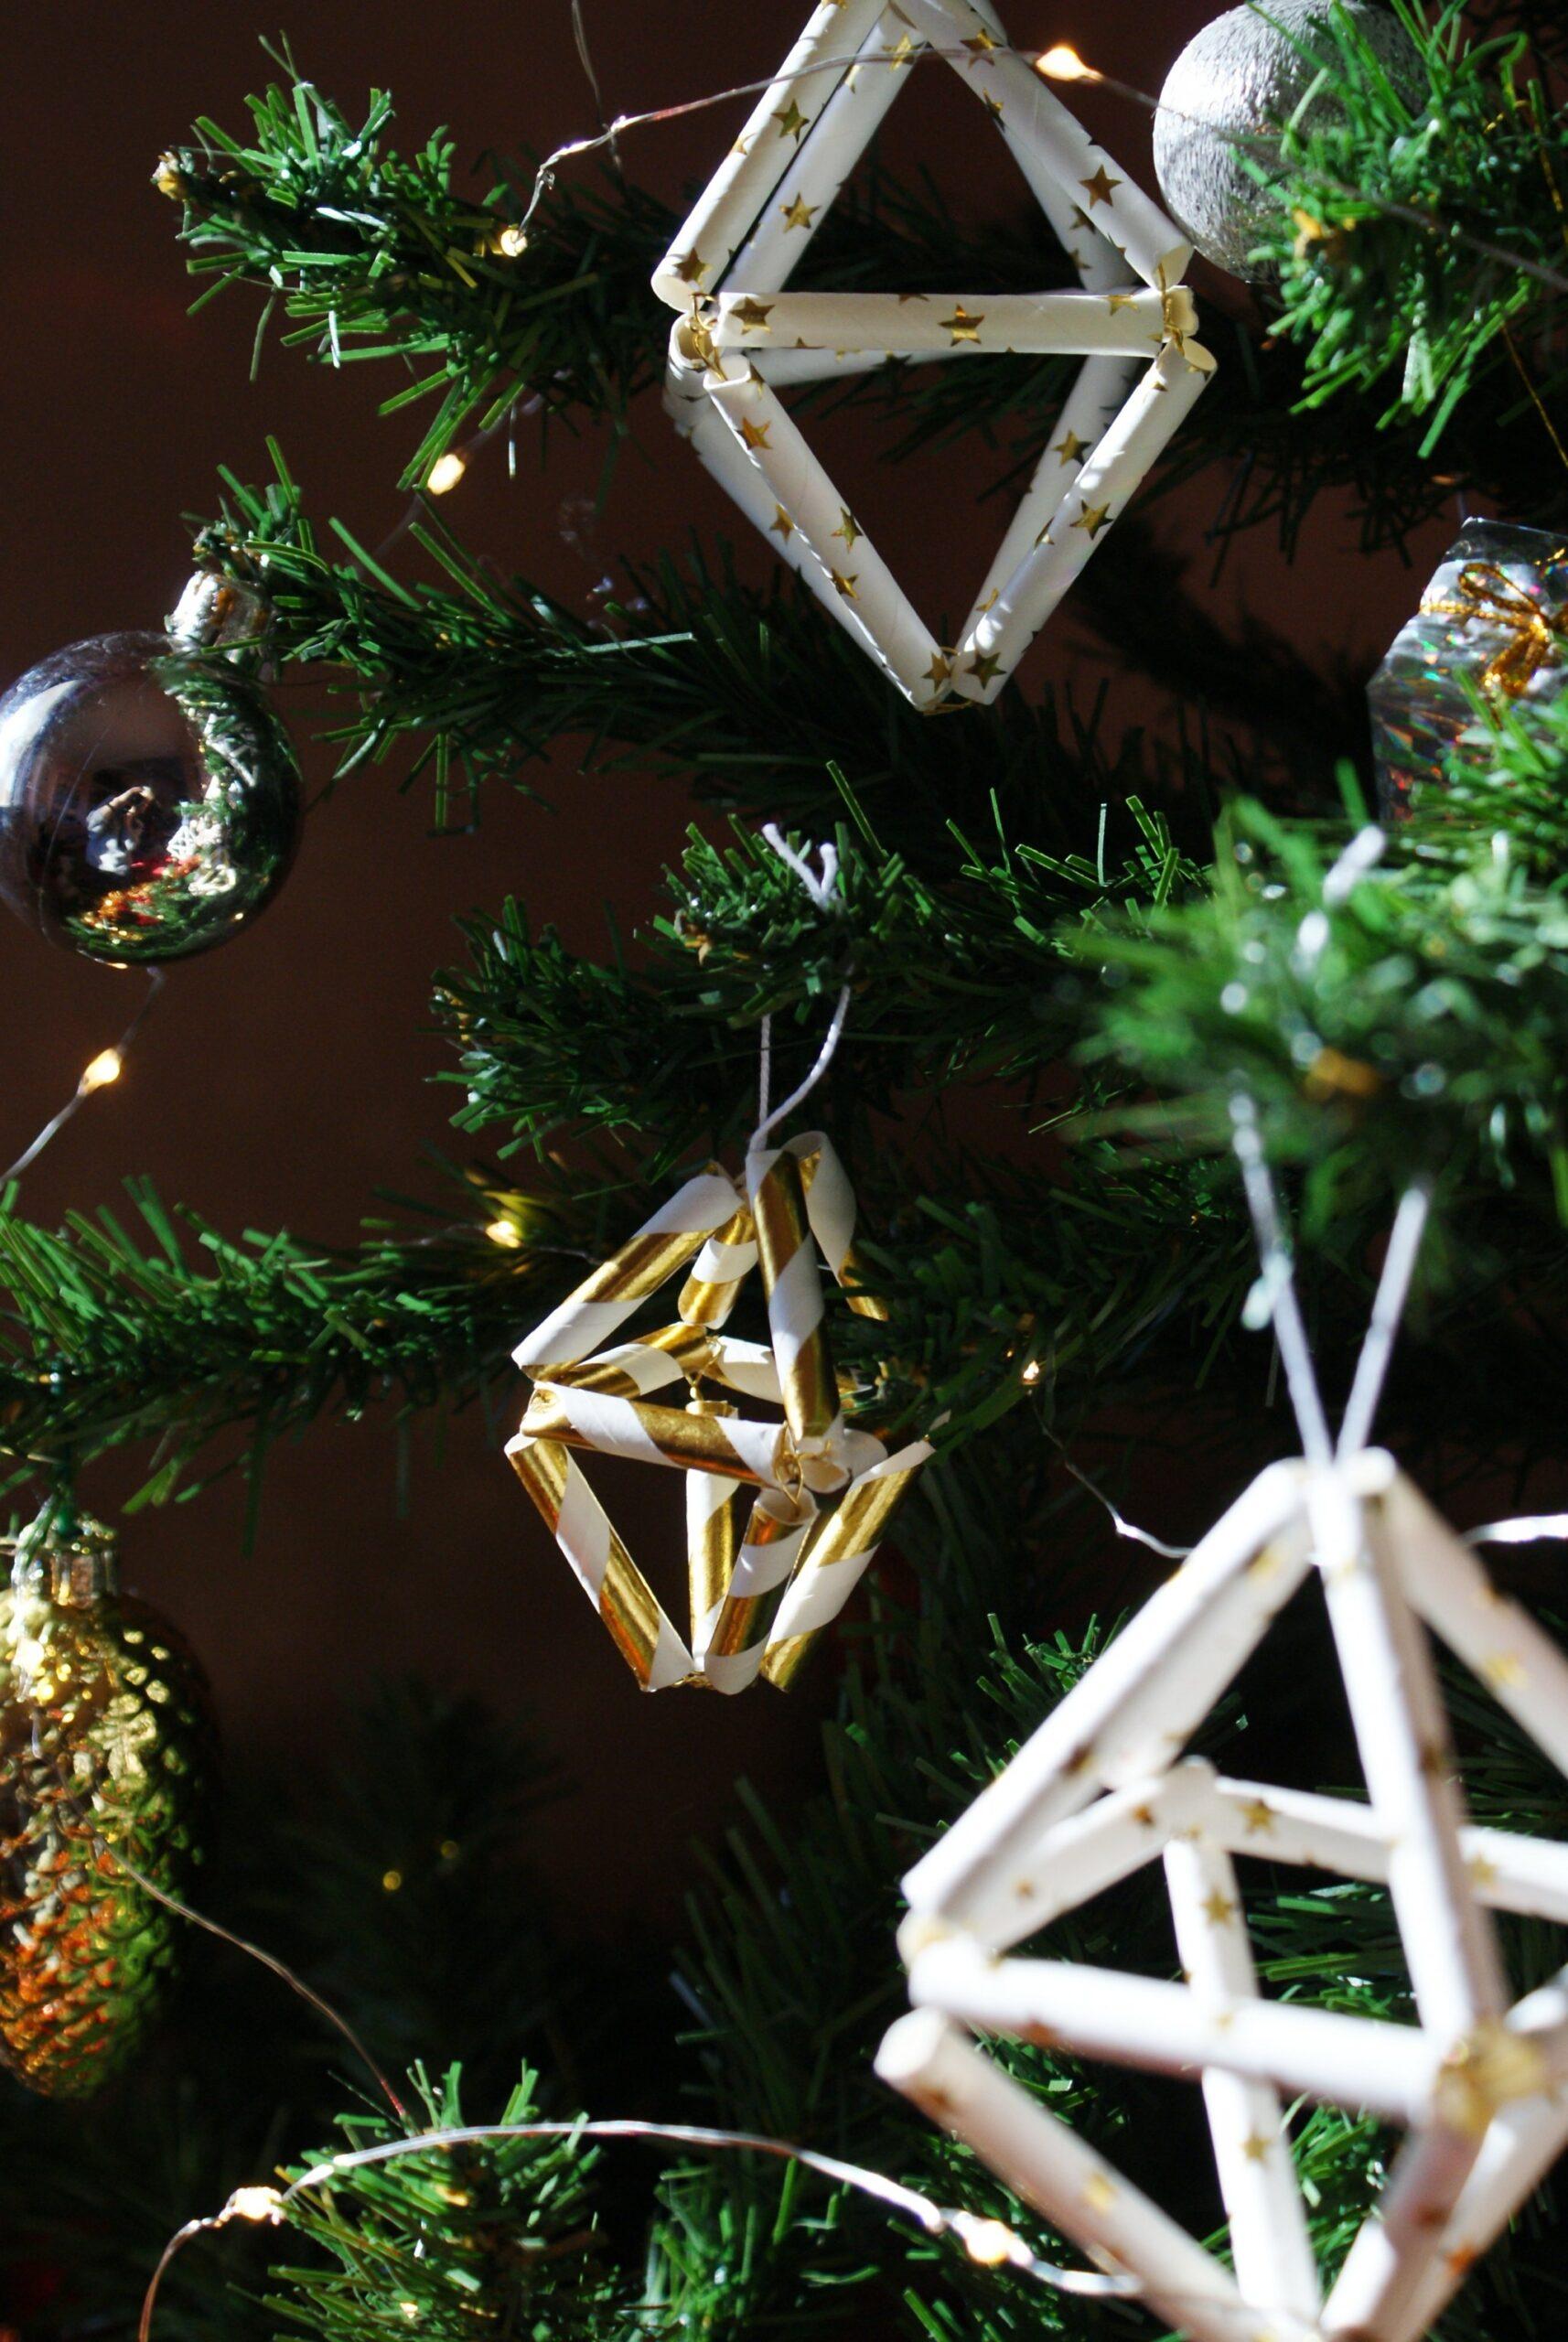 himmeli albero natale faidate decorazioni